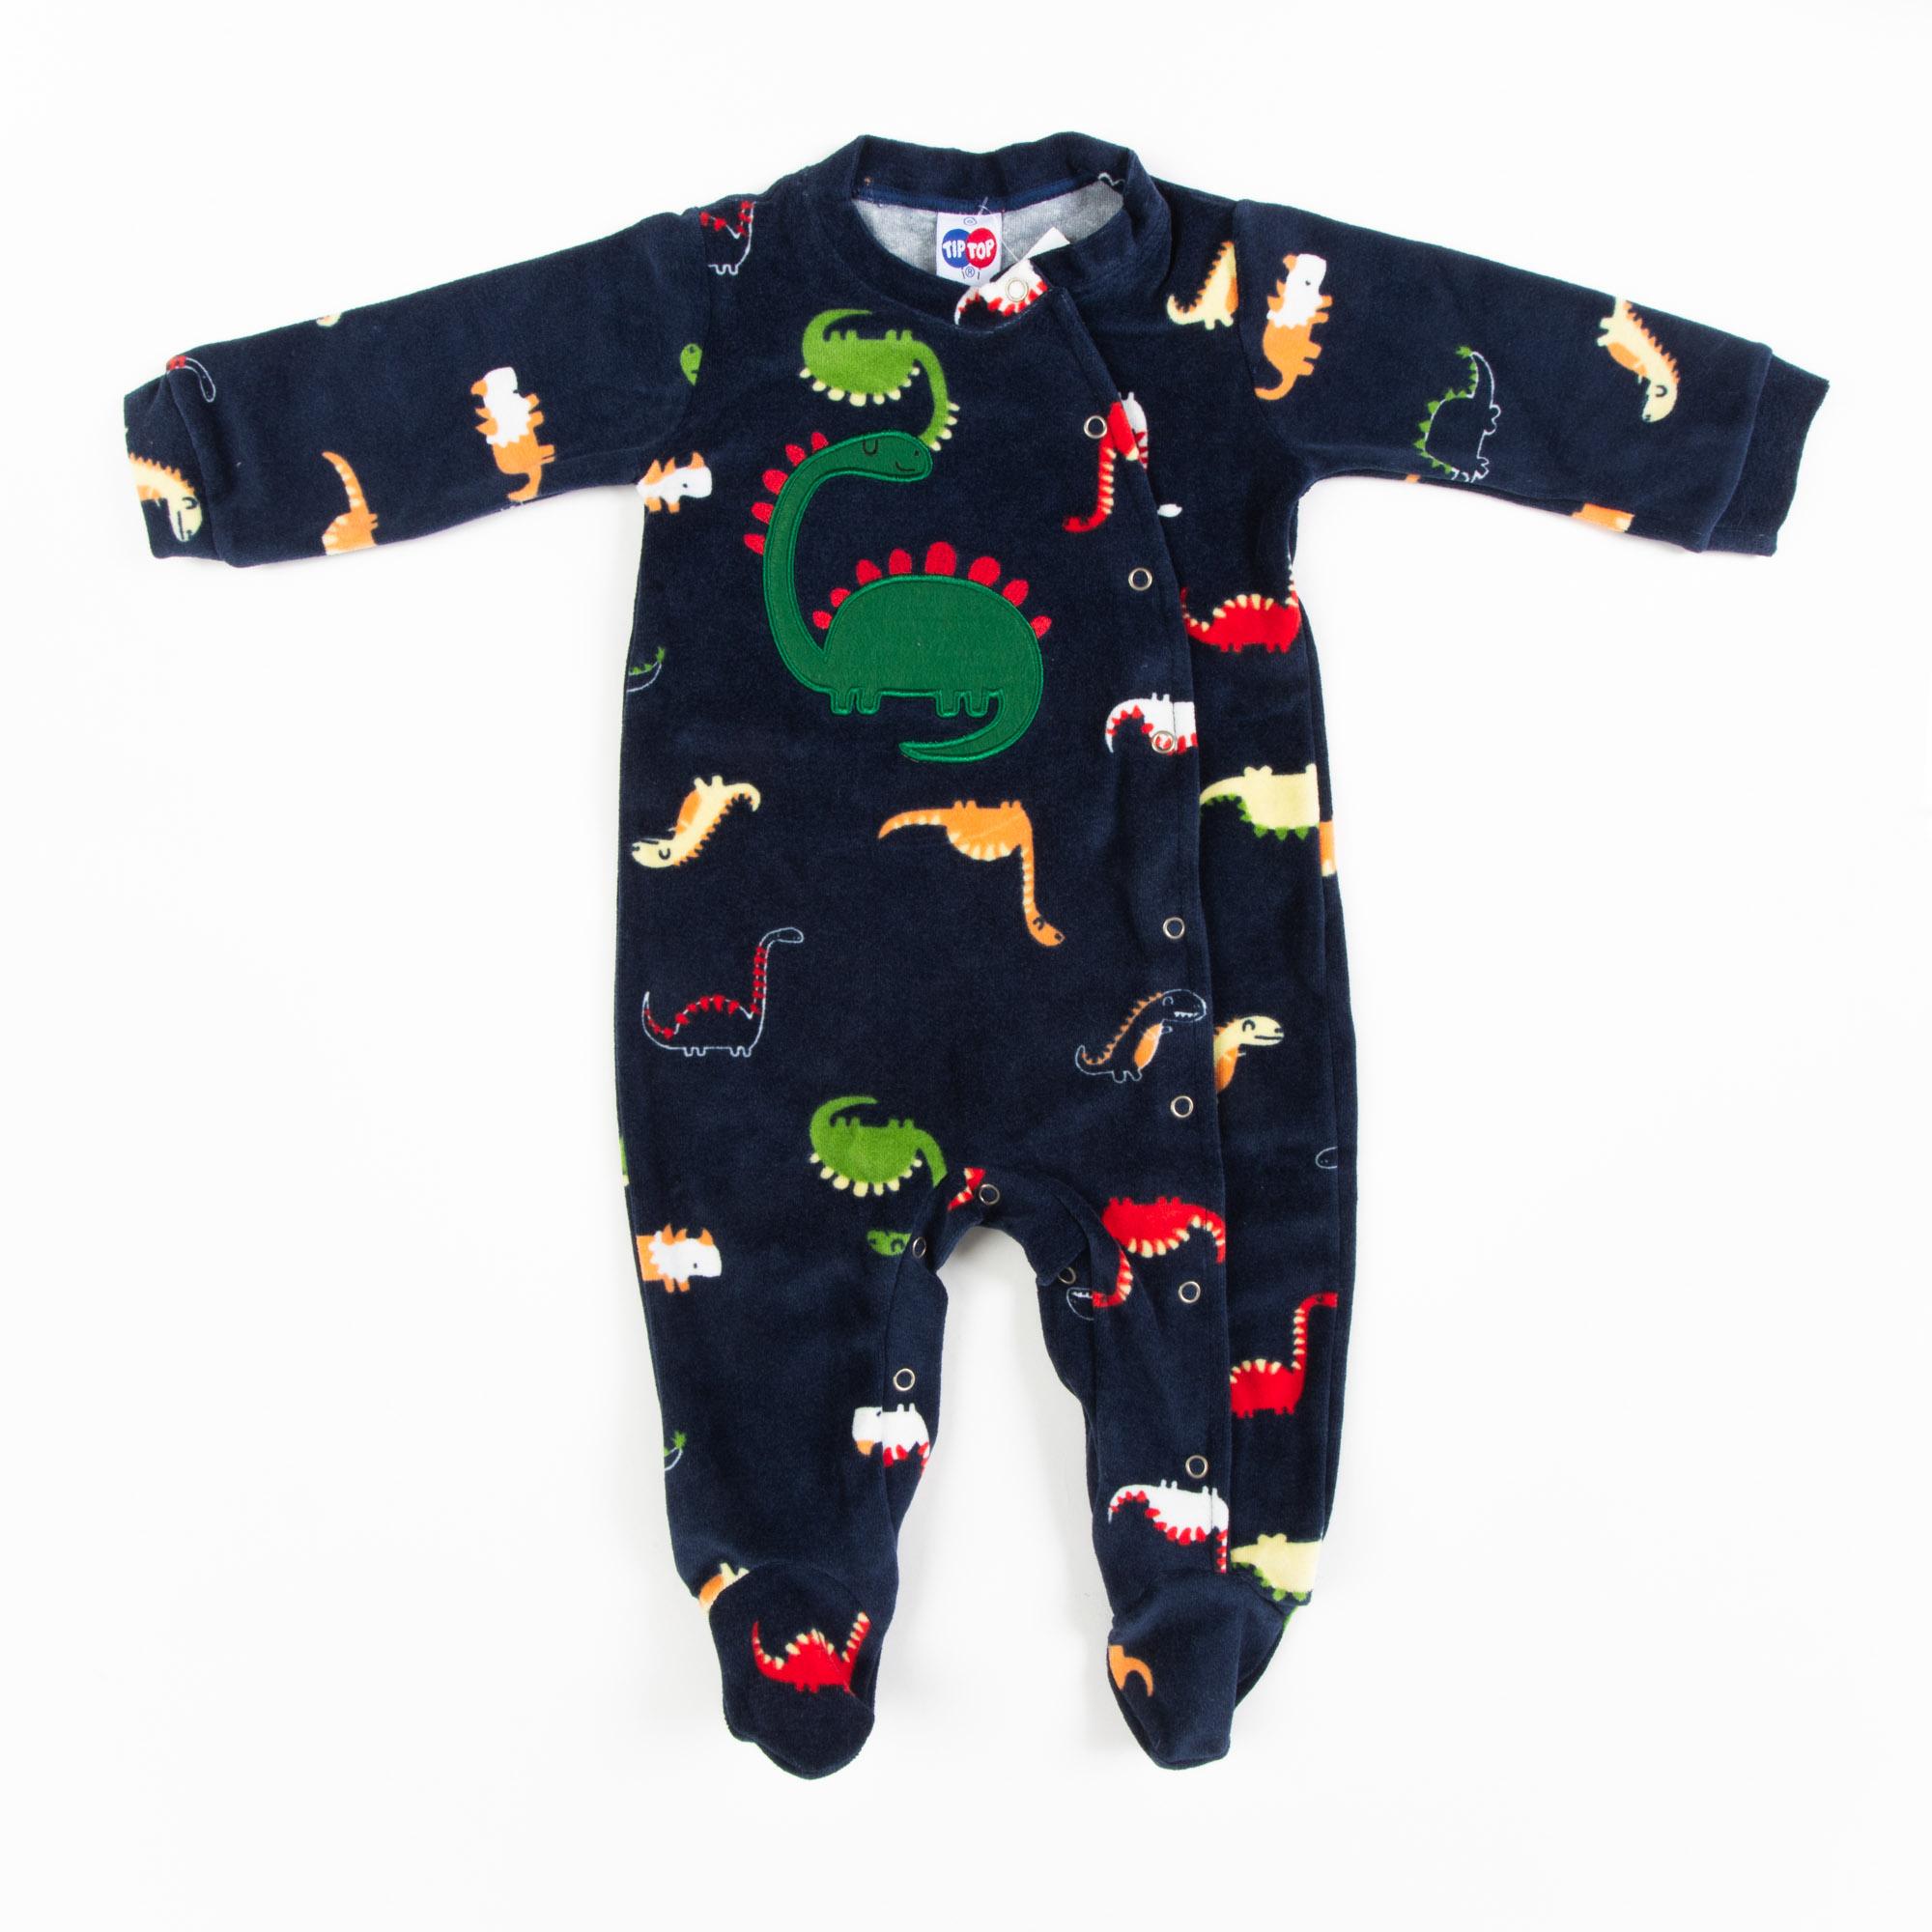 Macacão Dino Plush Bebê -Tip Top